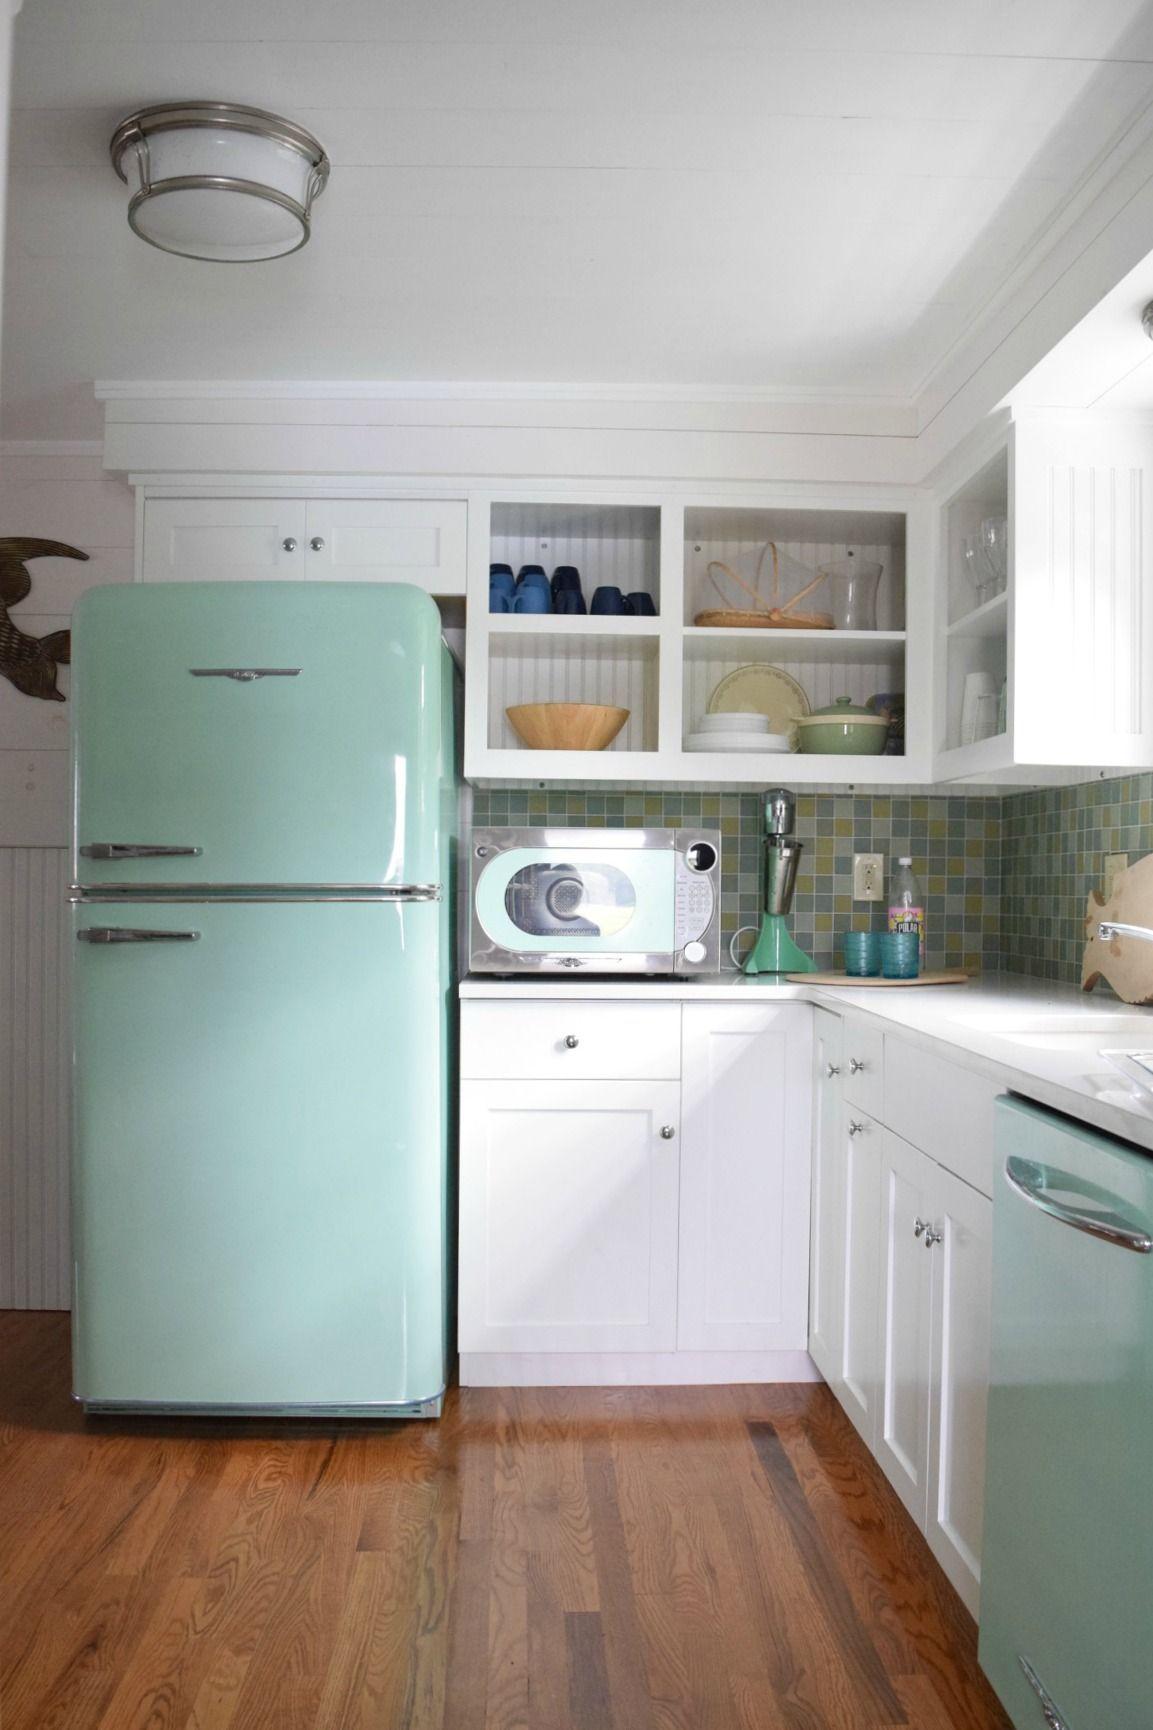 connecticut beach house tour and retro kitchen retro home decor